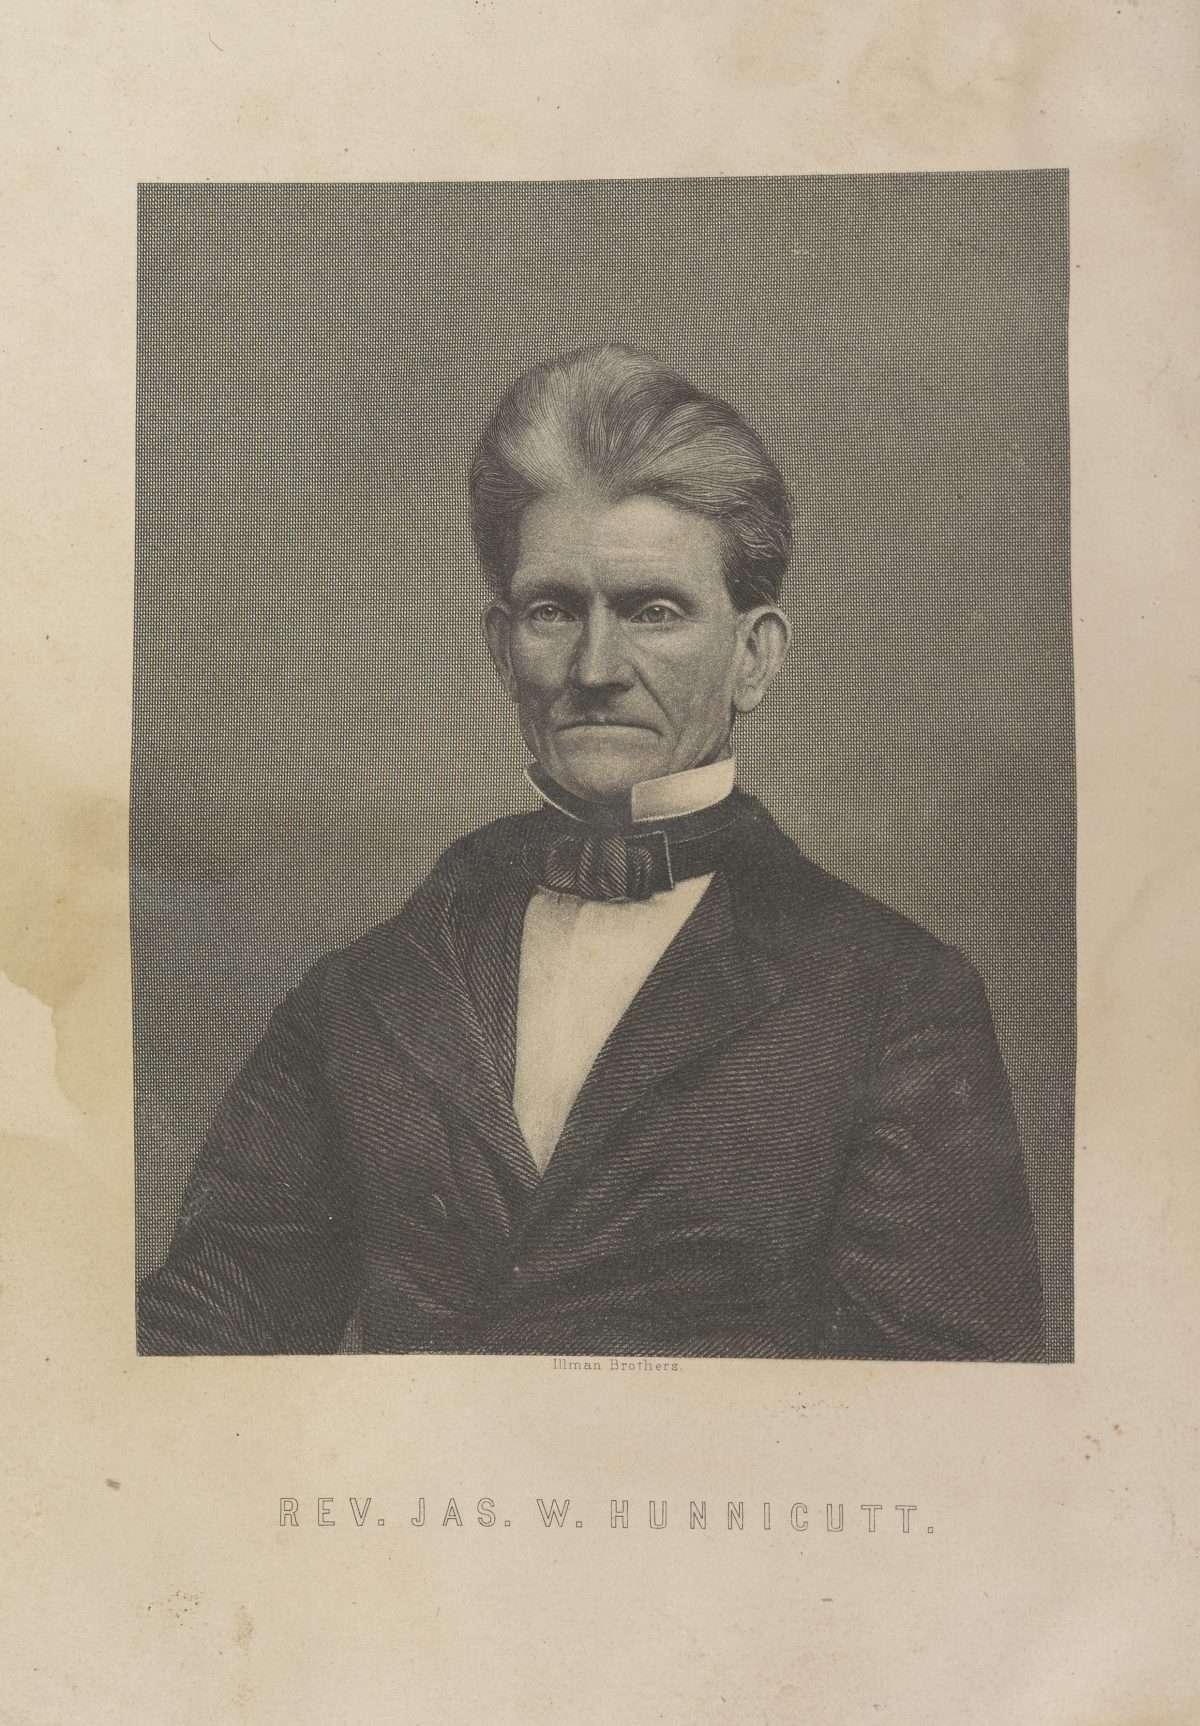 Rev. Jas. W. Hunnicutt.